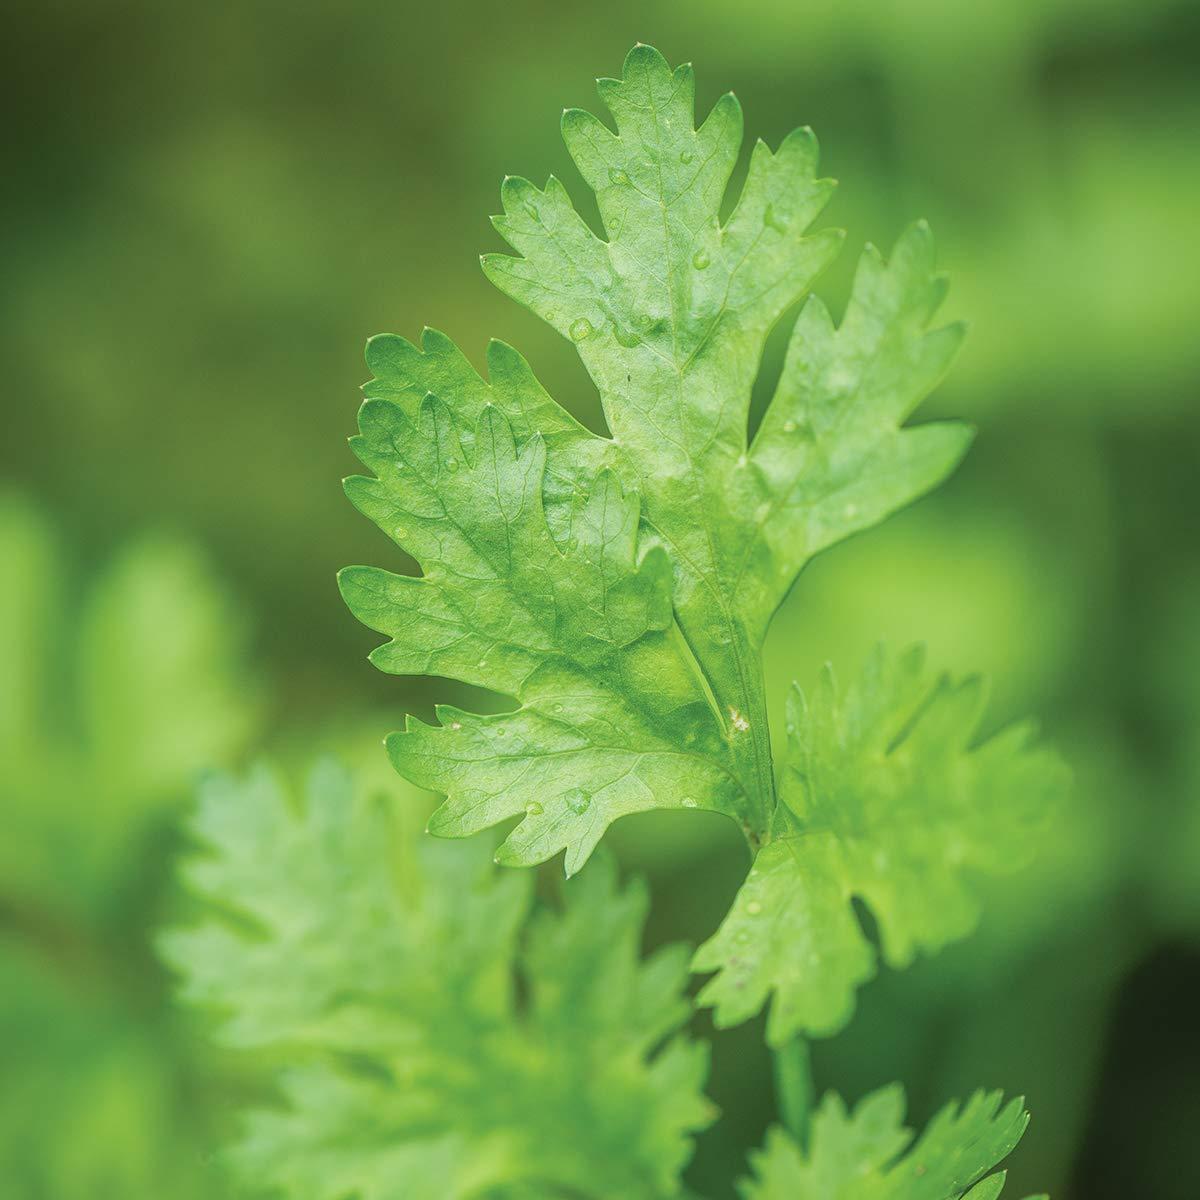 Burpee Calypso' Cilantro 3 Live Plants, 2 1/2'' Pot